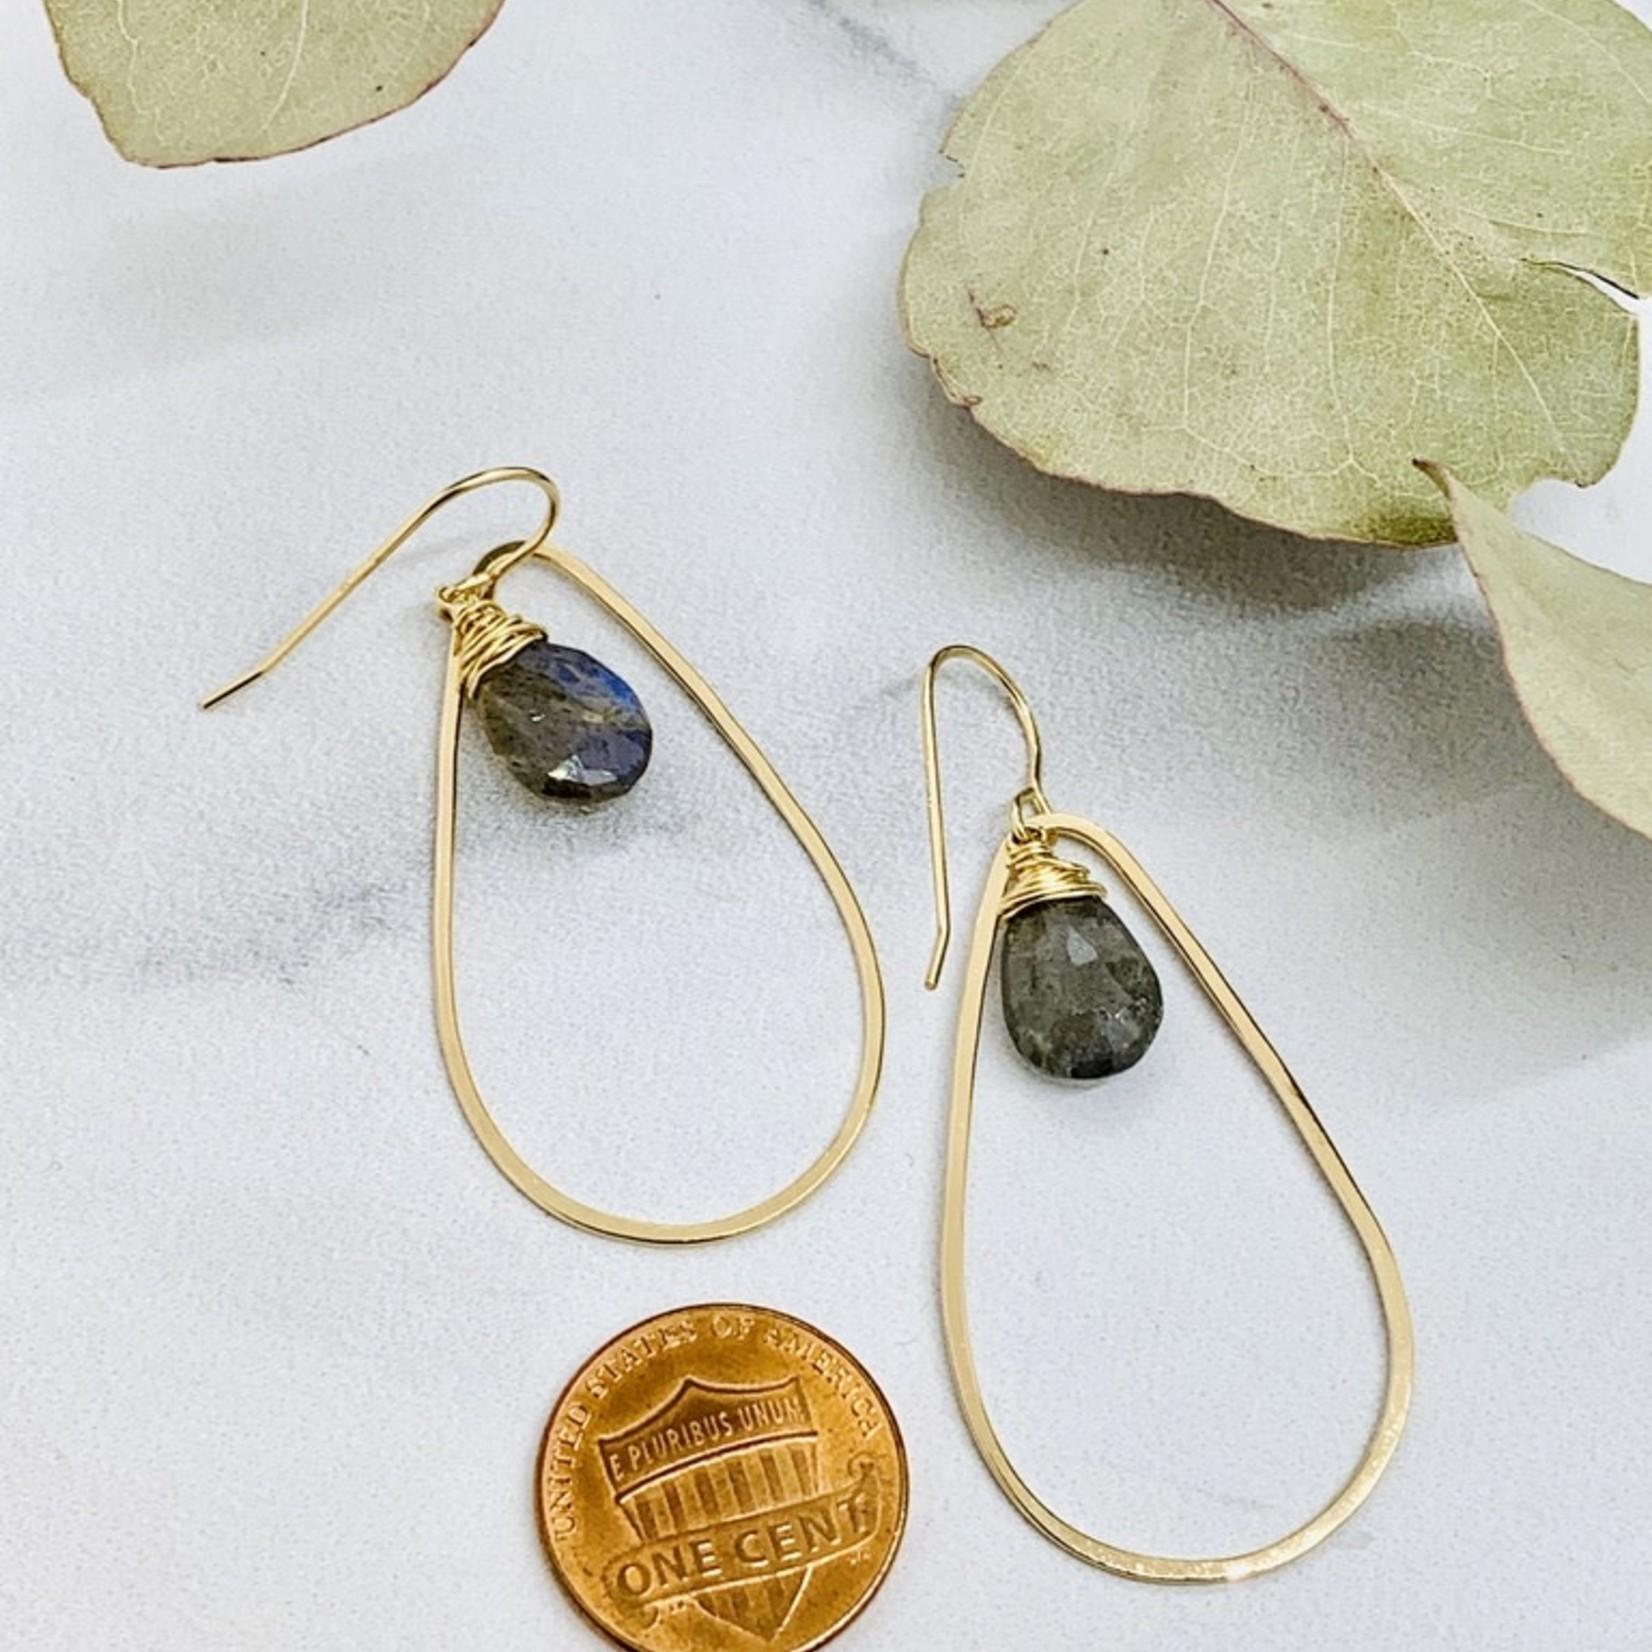 Handmade Faceted 12mm Labradorite pear in 14kt Gold filled Teardrop Earring